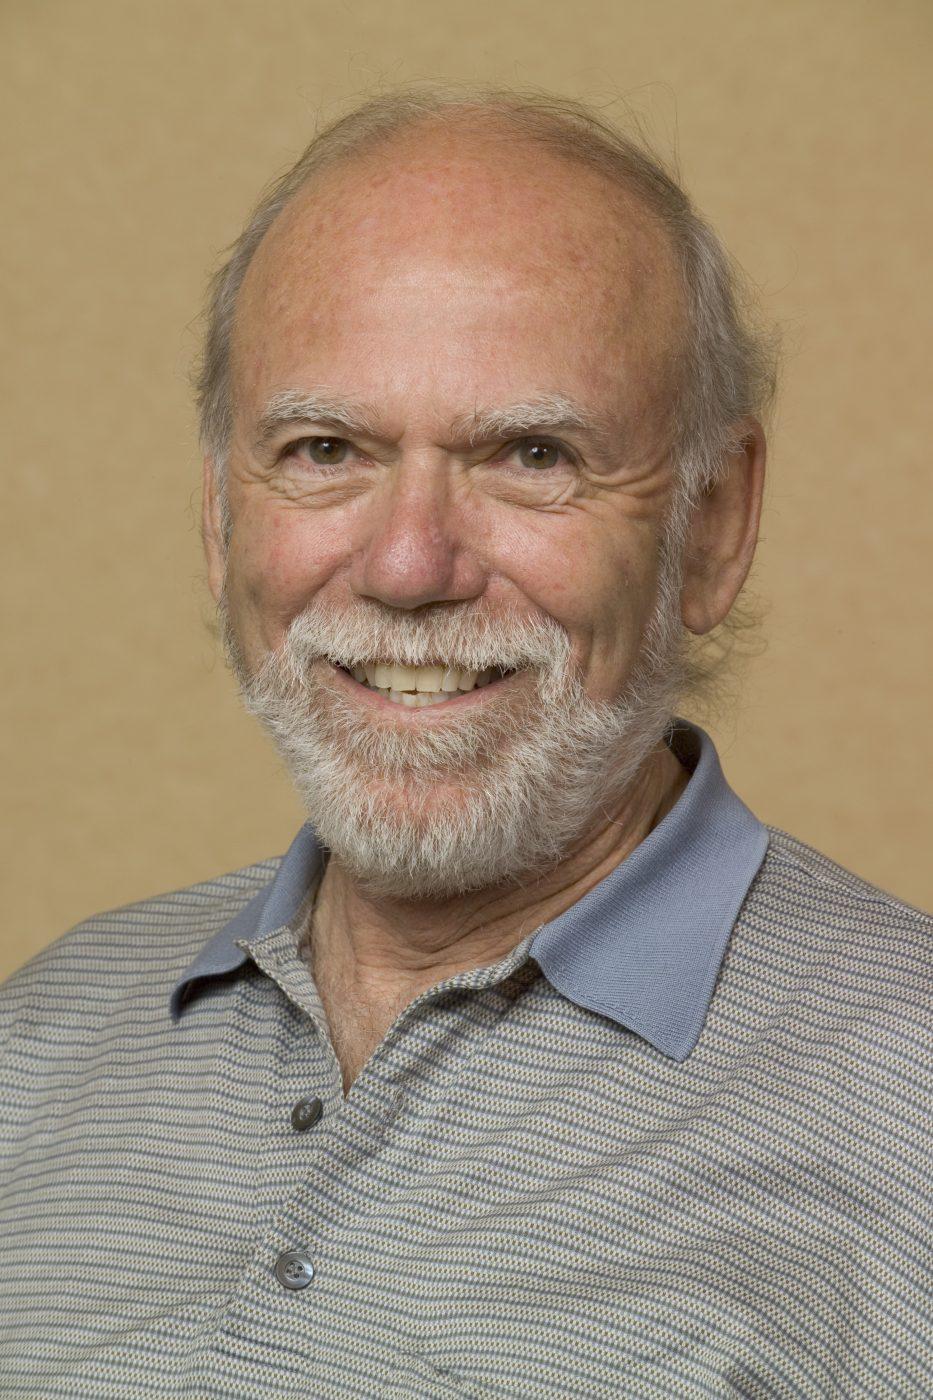 Barry Barish, Attribution-R. Hahn